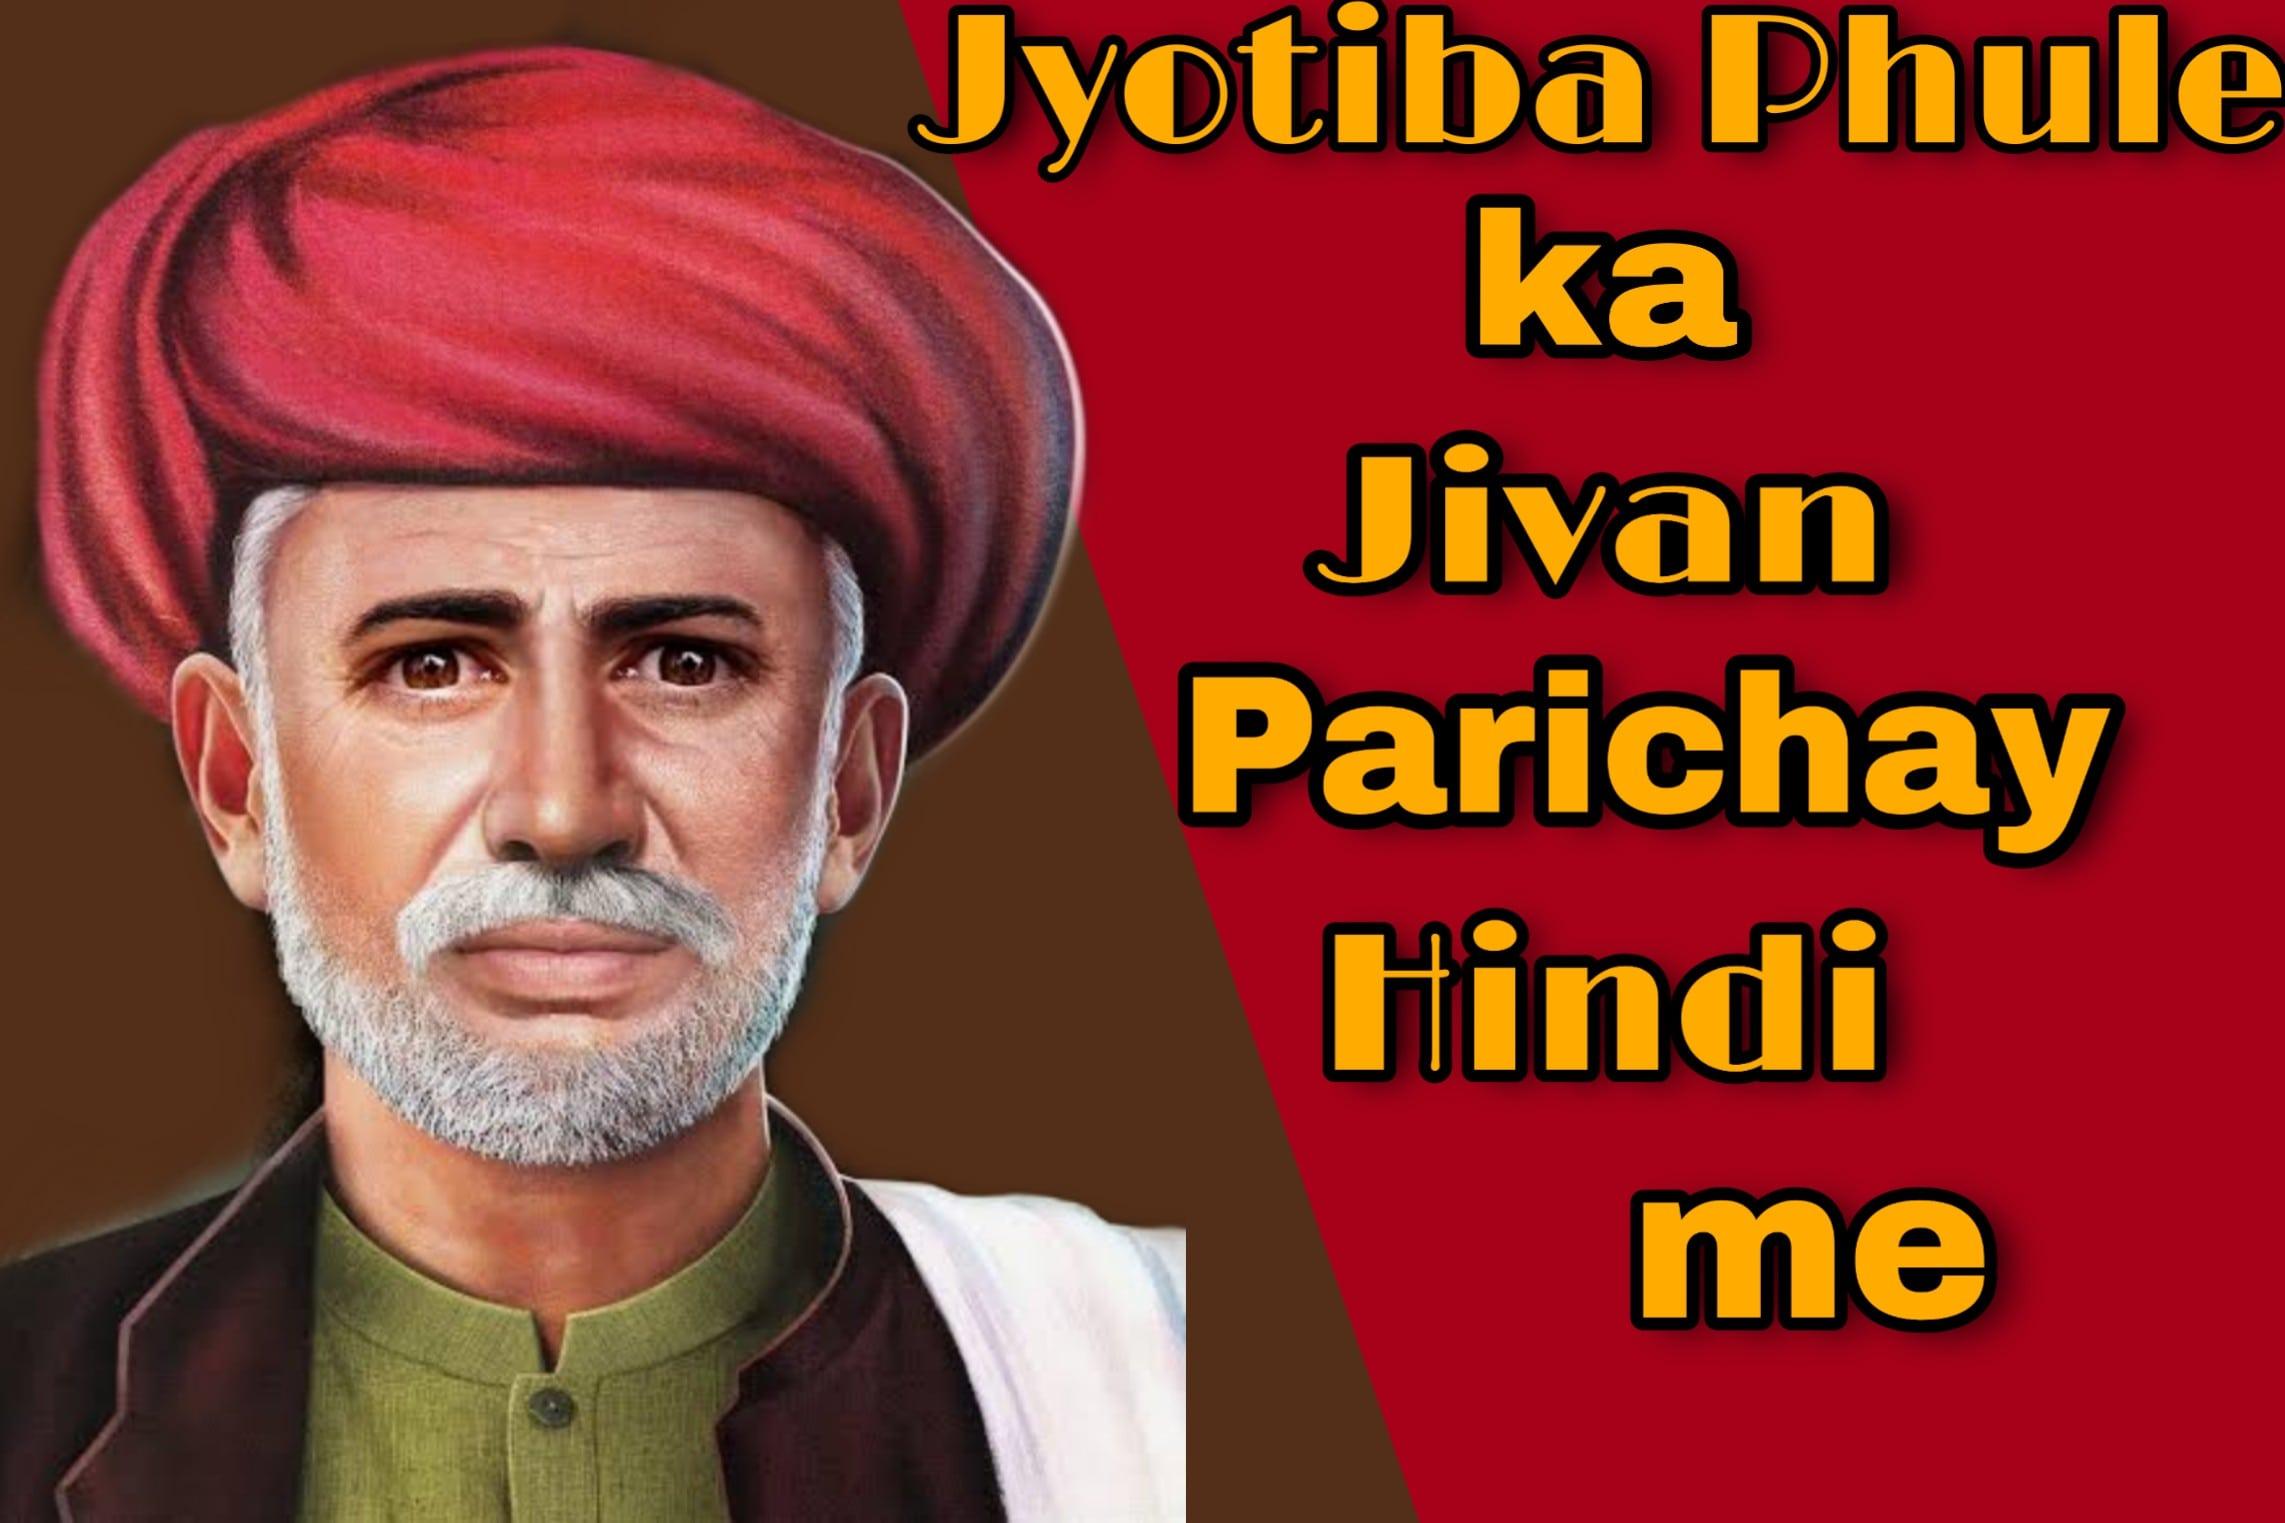 Jyotiba Phule ka Jivan Parichay